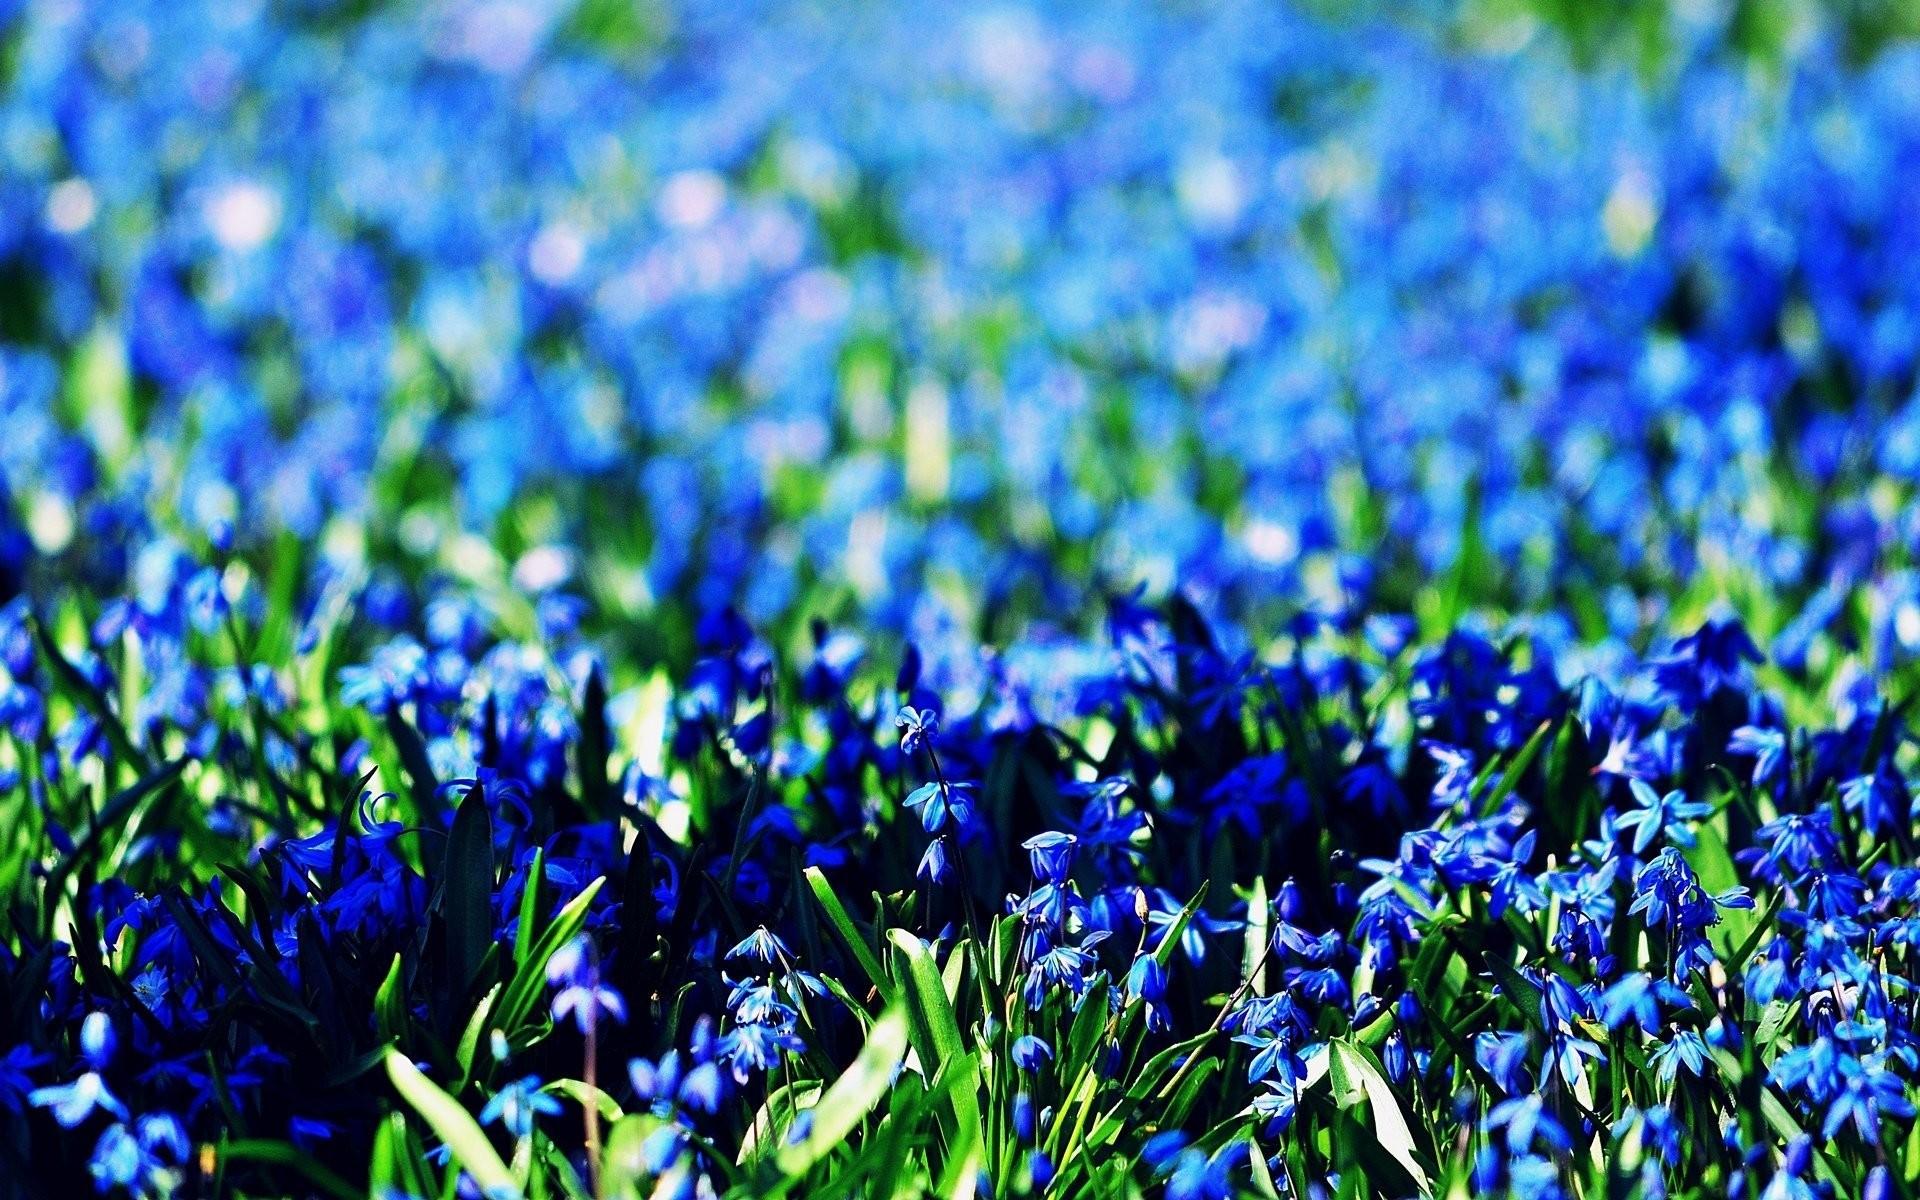 flower flowers blue blue the field background flowers blue wallpaper  widescreen full screen widescreen hd wallpapers